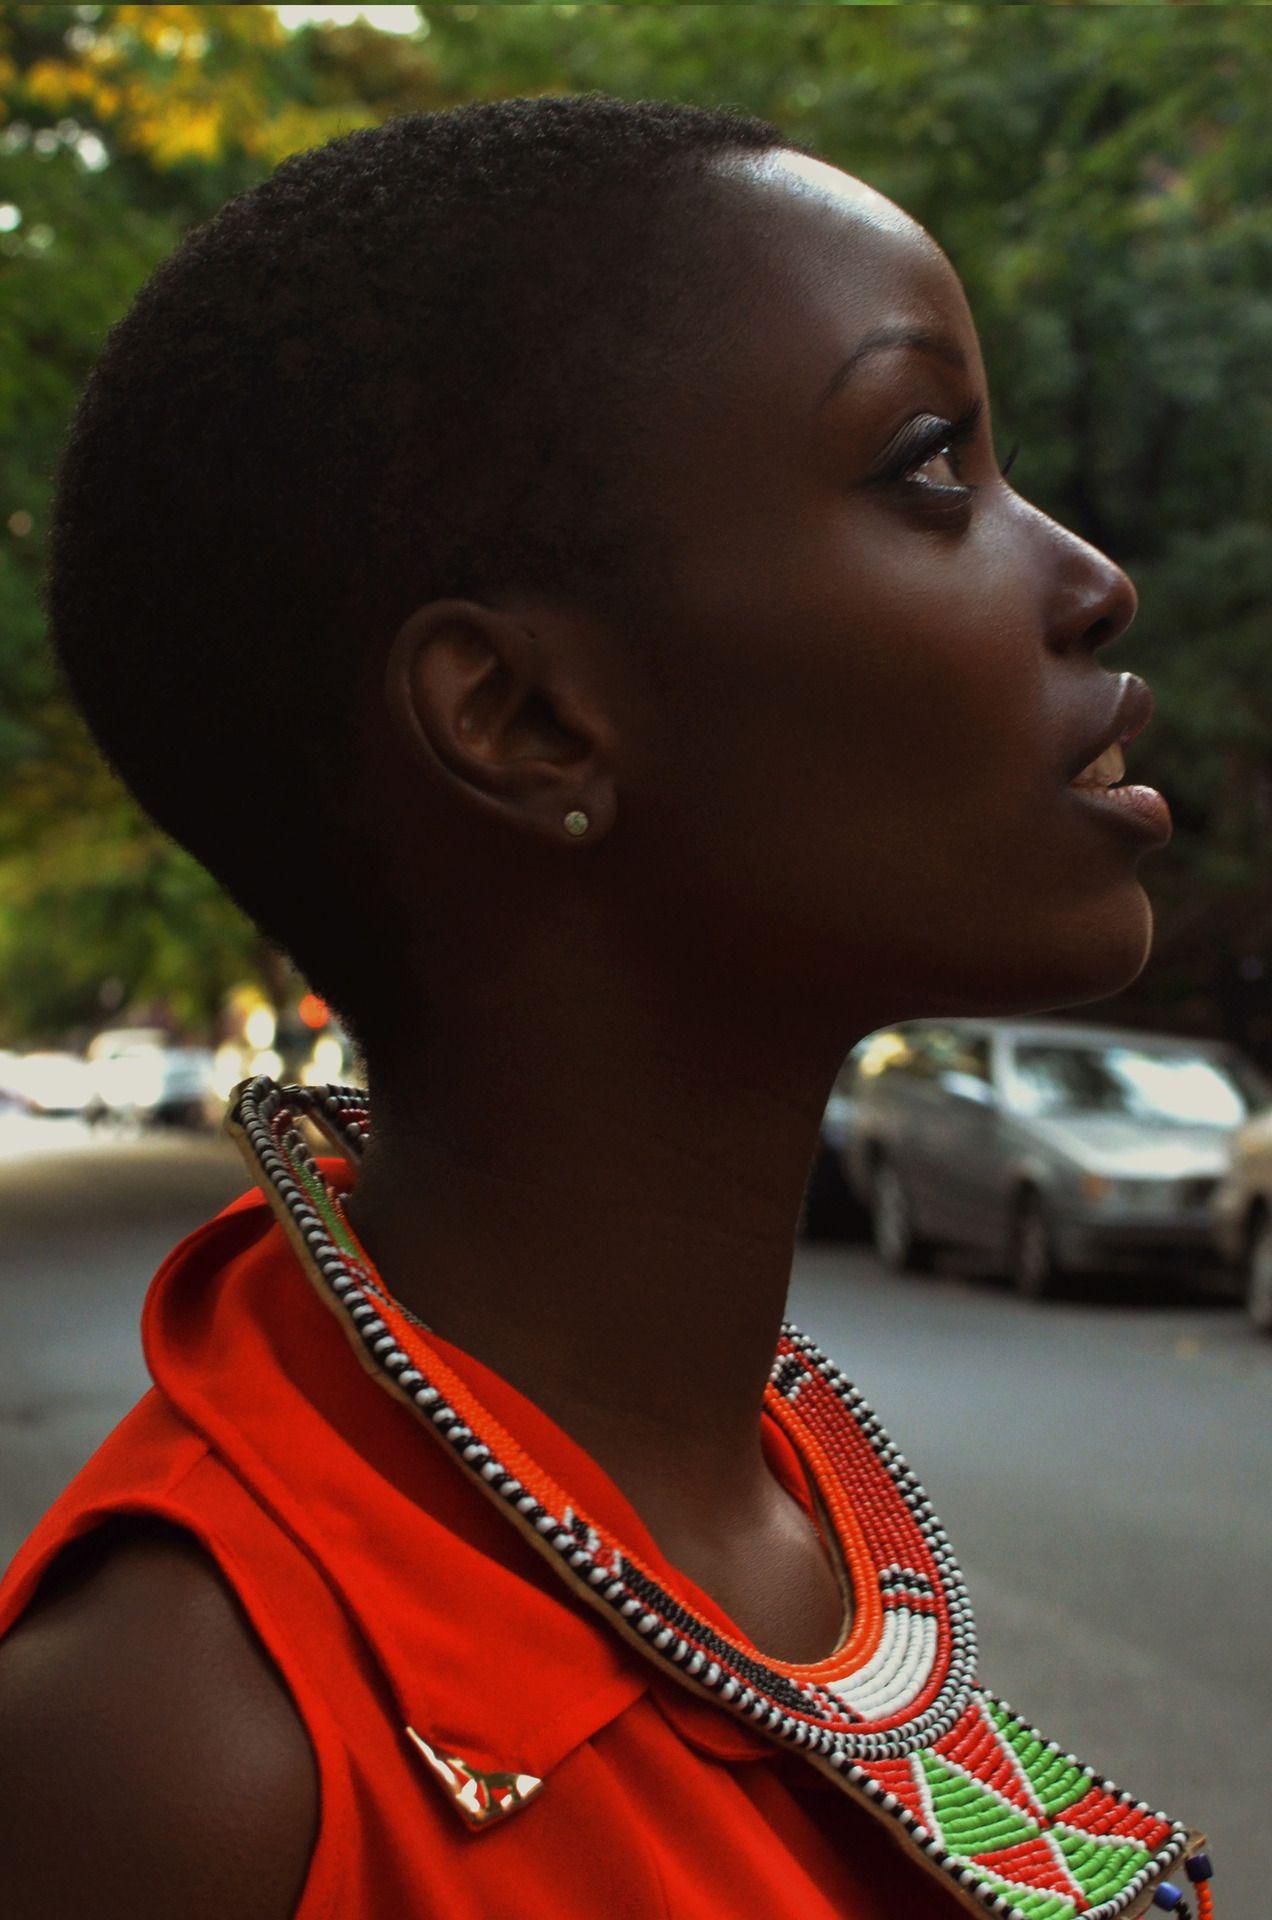 shot by Mambu Bayoh Instagram :: MambuBayoh Do not remove tag #africanbeauty